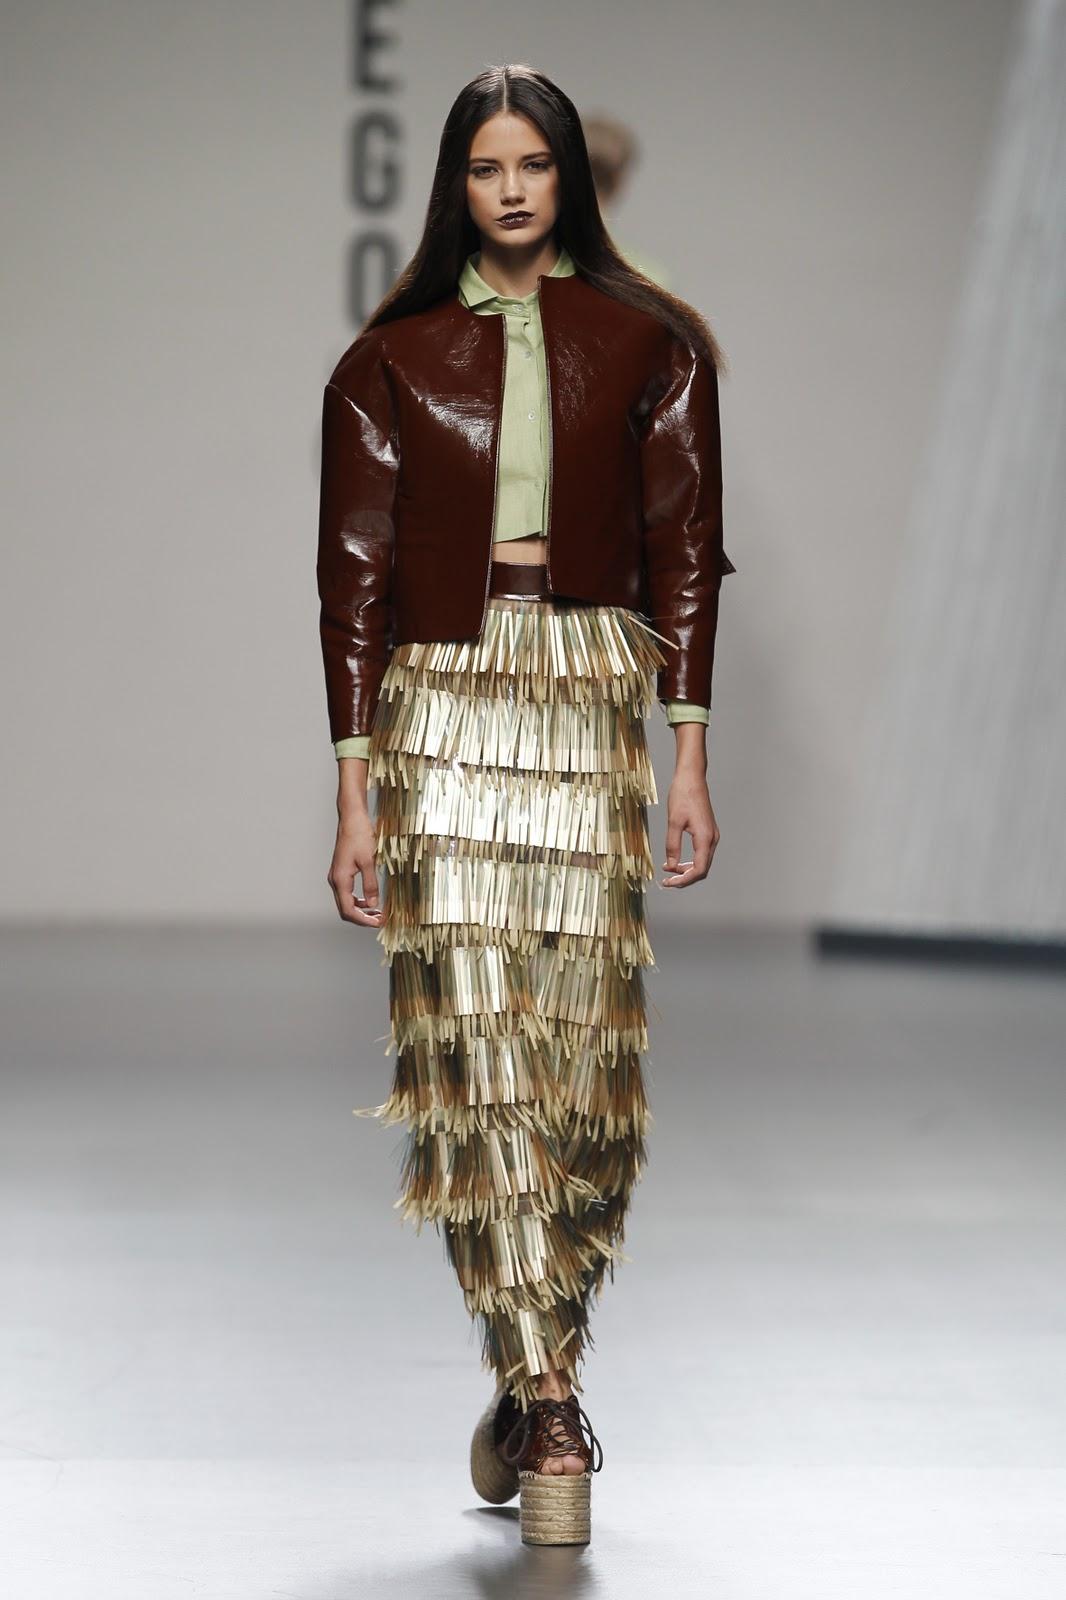 Fashion Studio Magazine Cmfw Ss 2012 Day 5